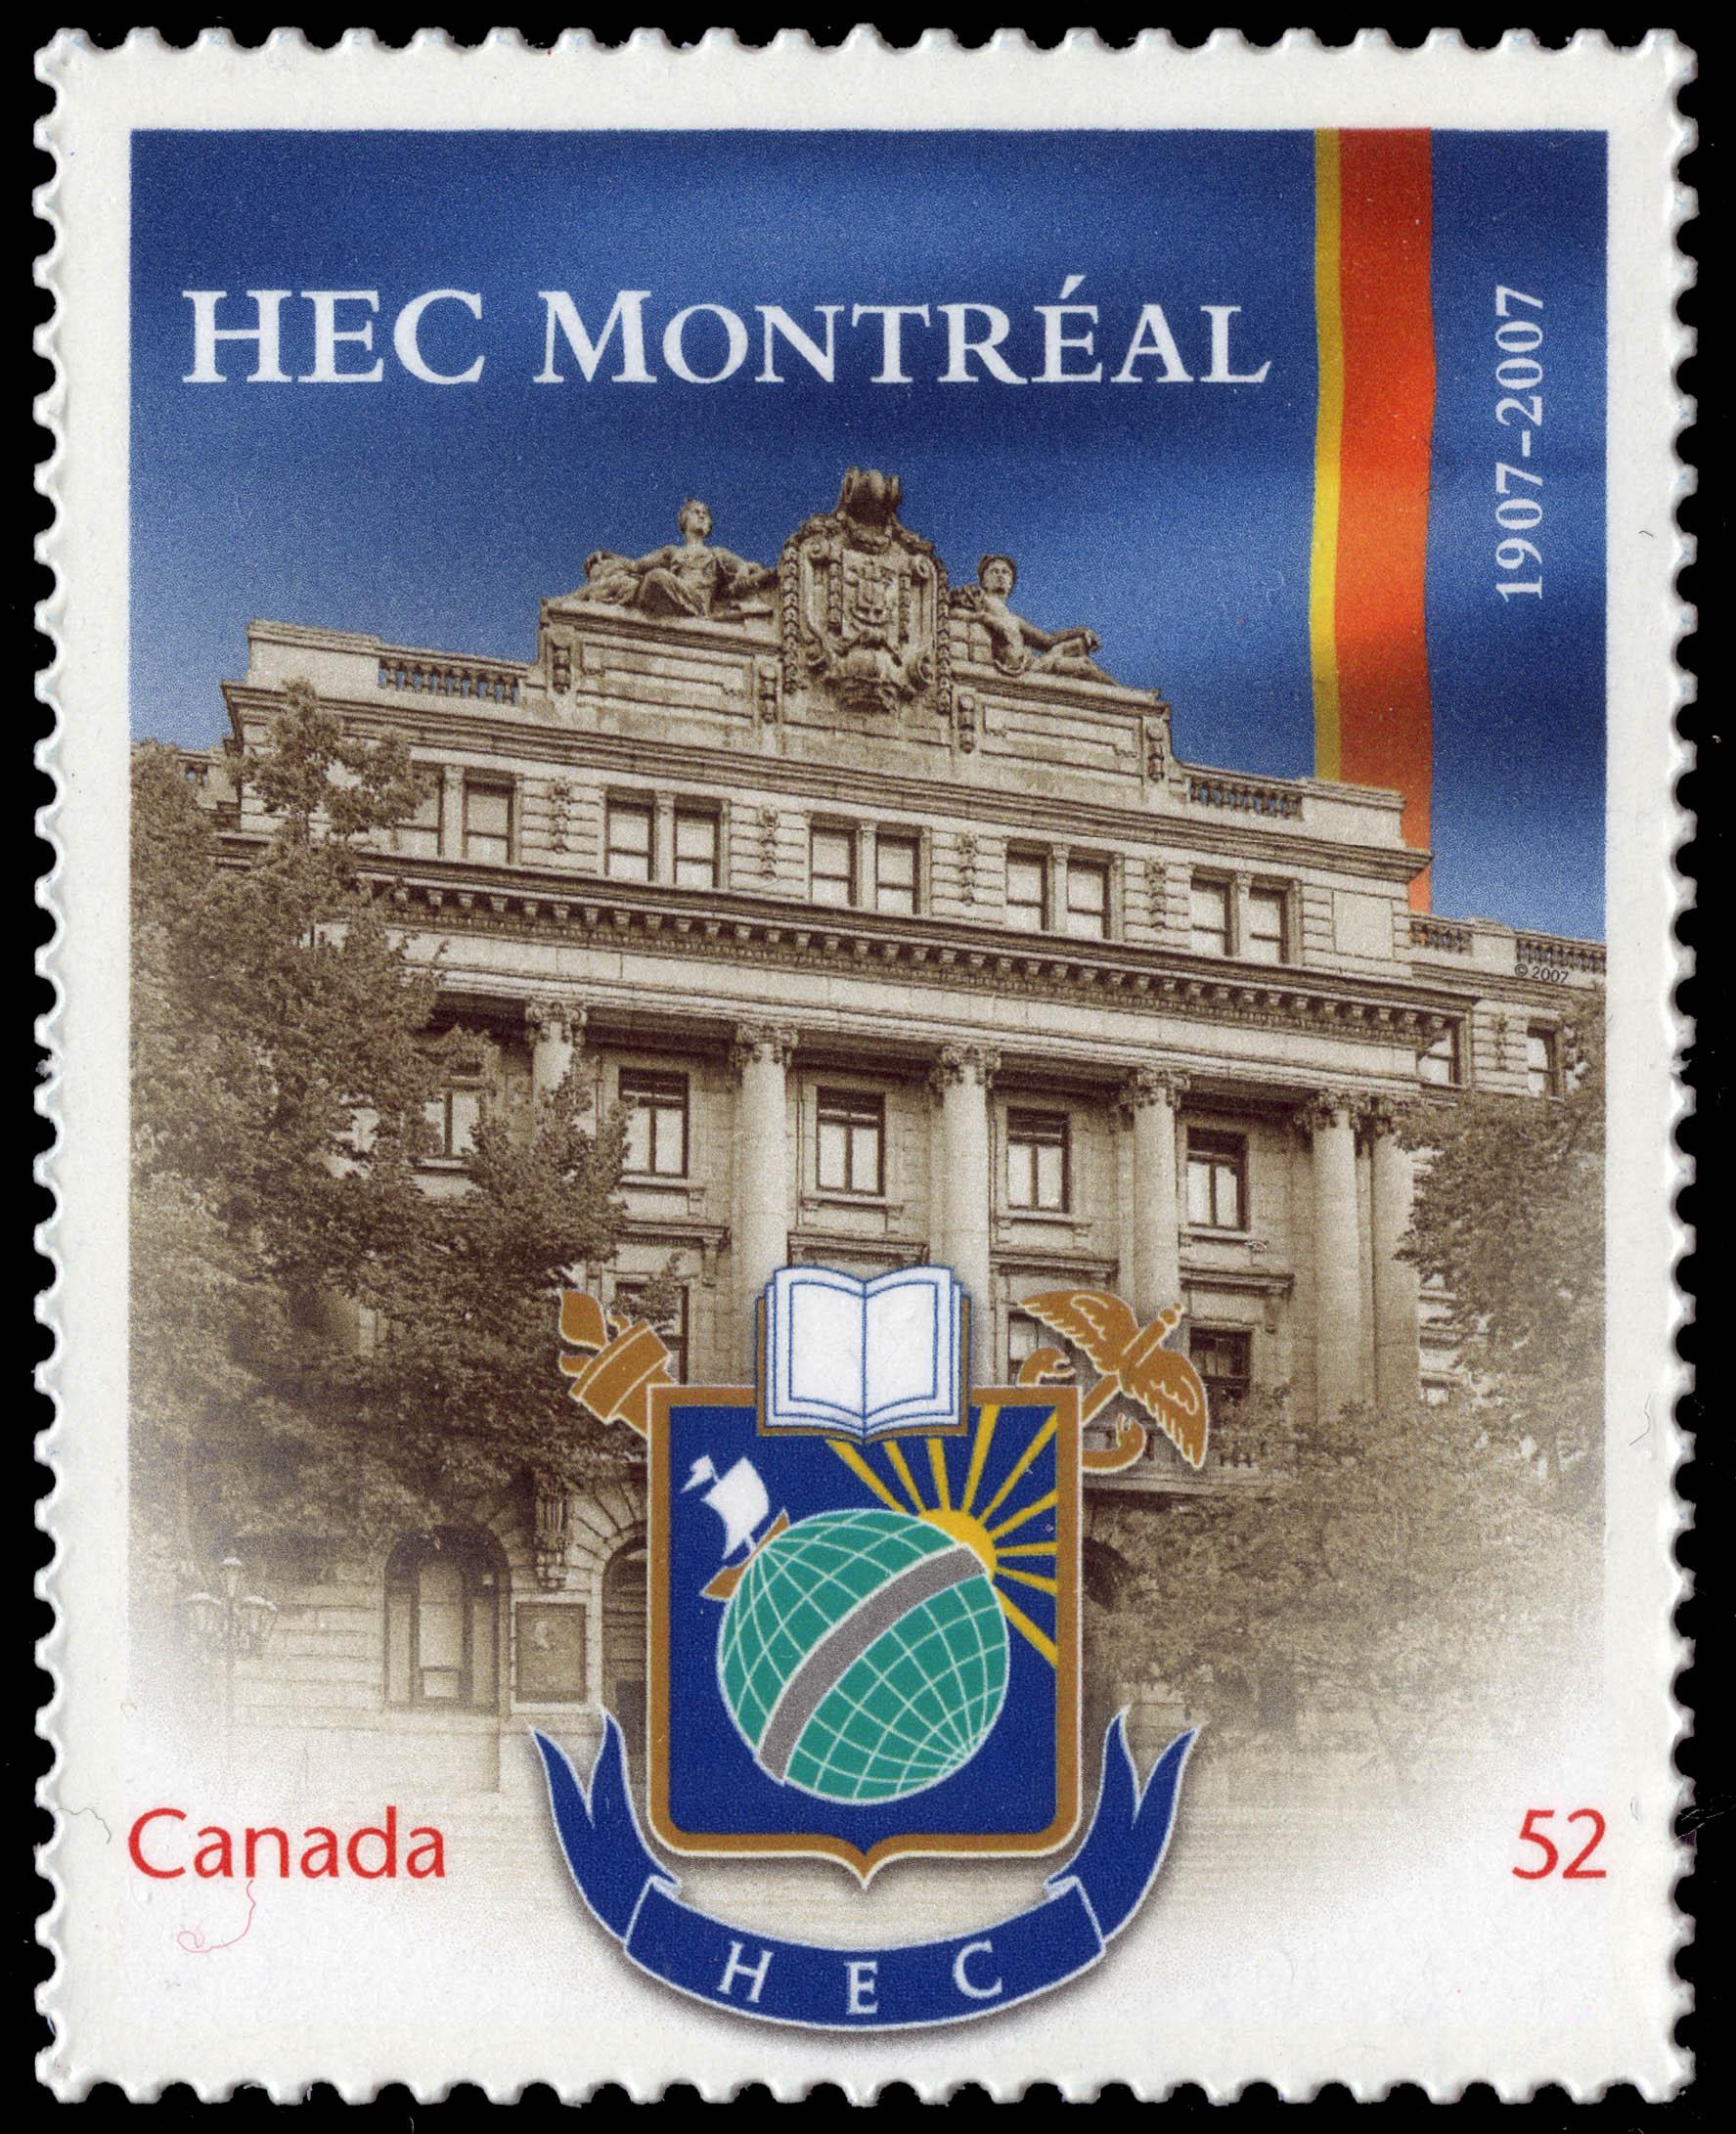 HEC Montreal - 1907-2007 Canada Postage Stamp | Canadian Universities